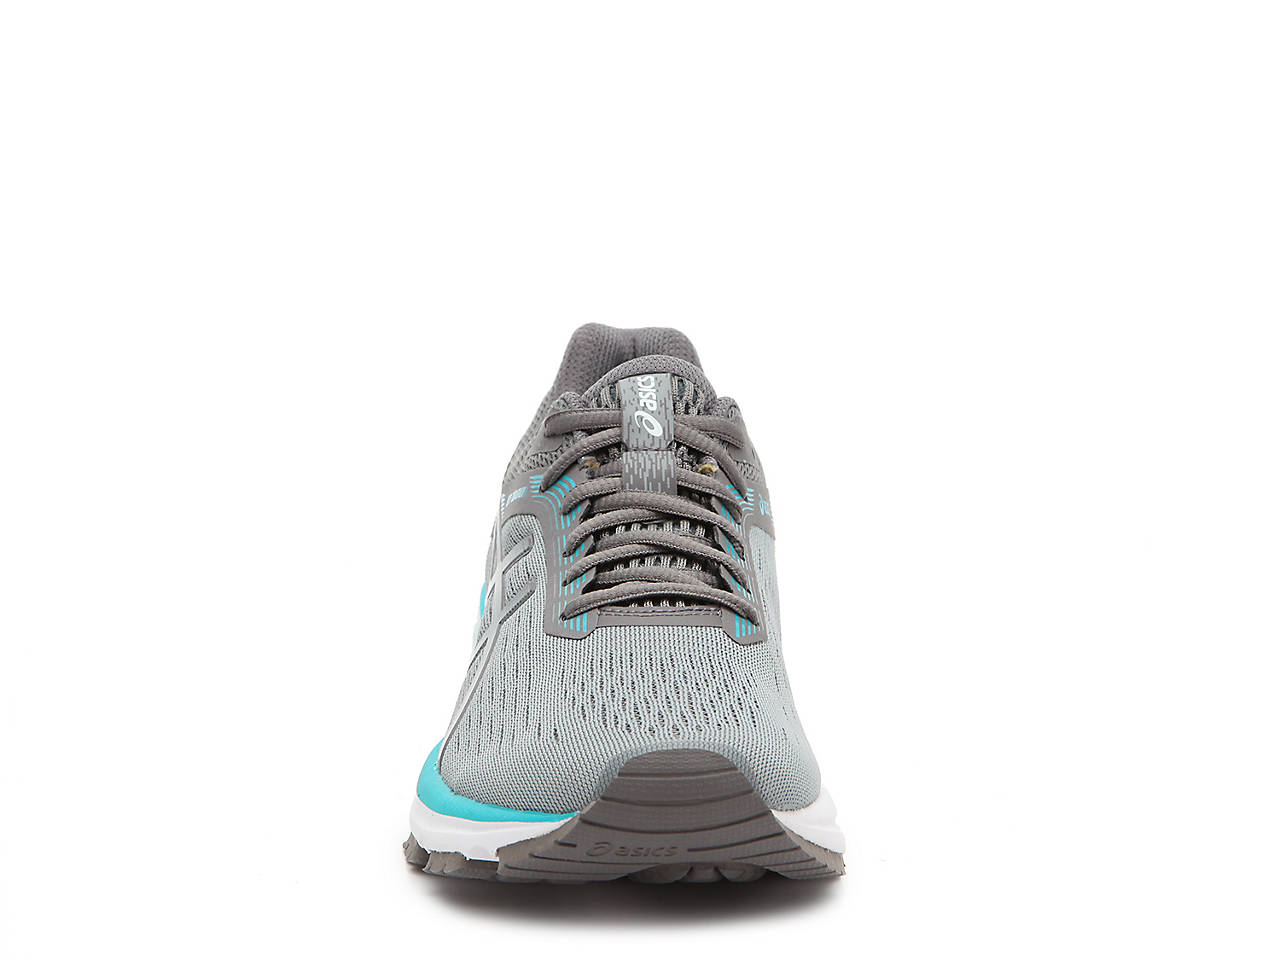 ASICS GT-1000 7 Running Shoe - Women's Women's Shoes | DSW